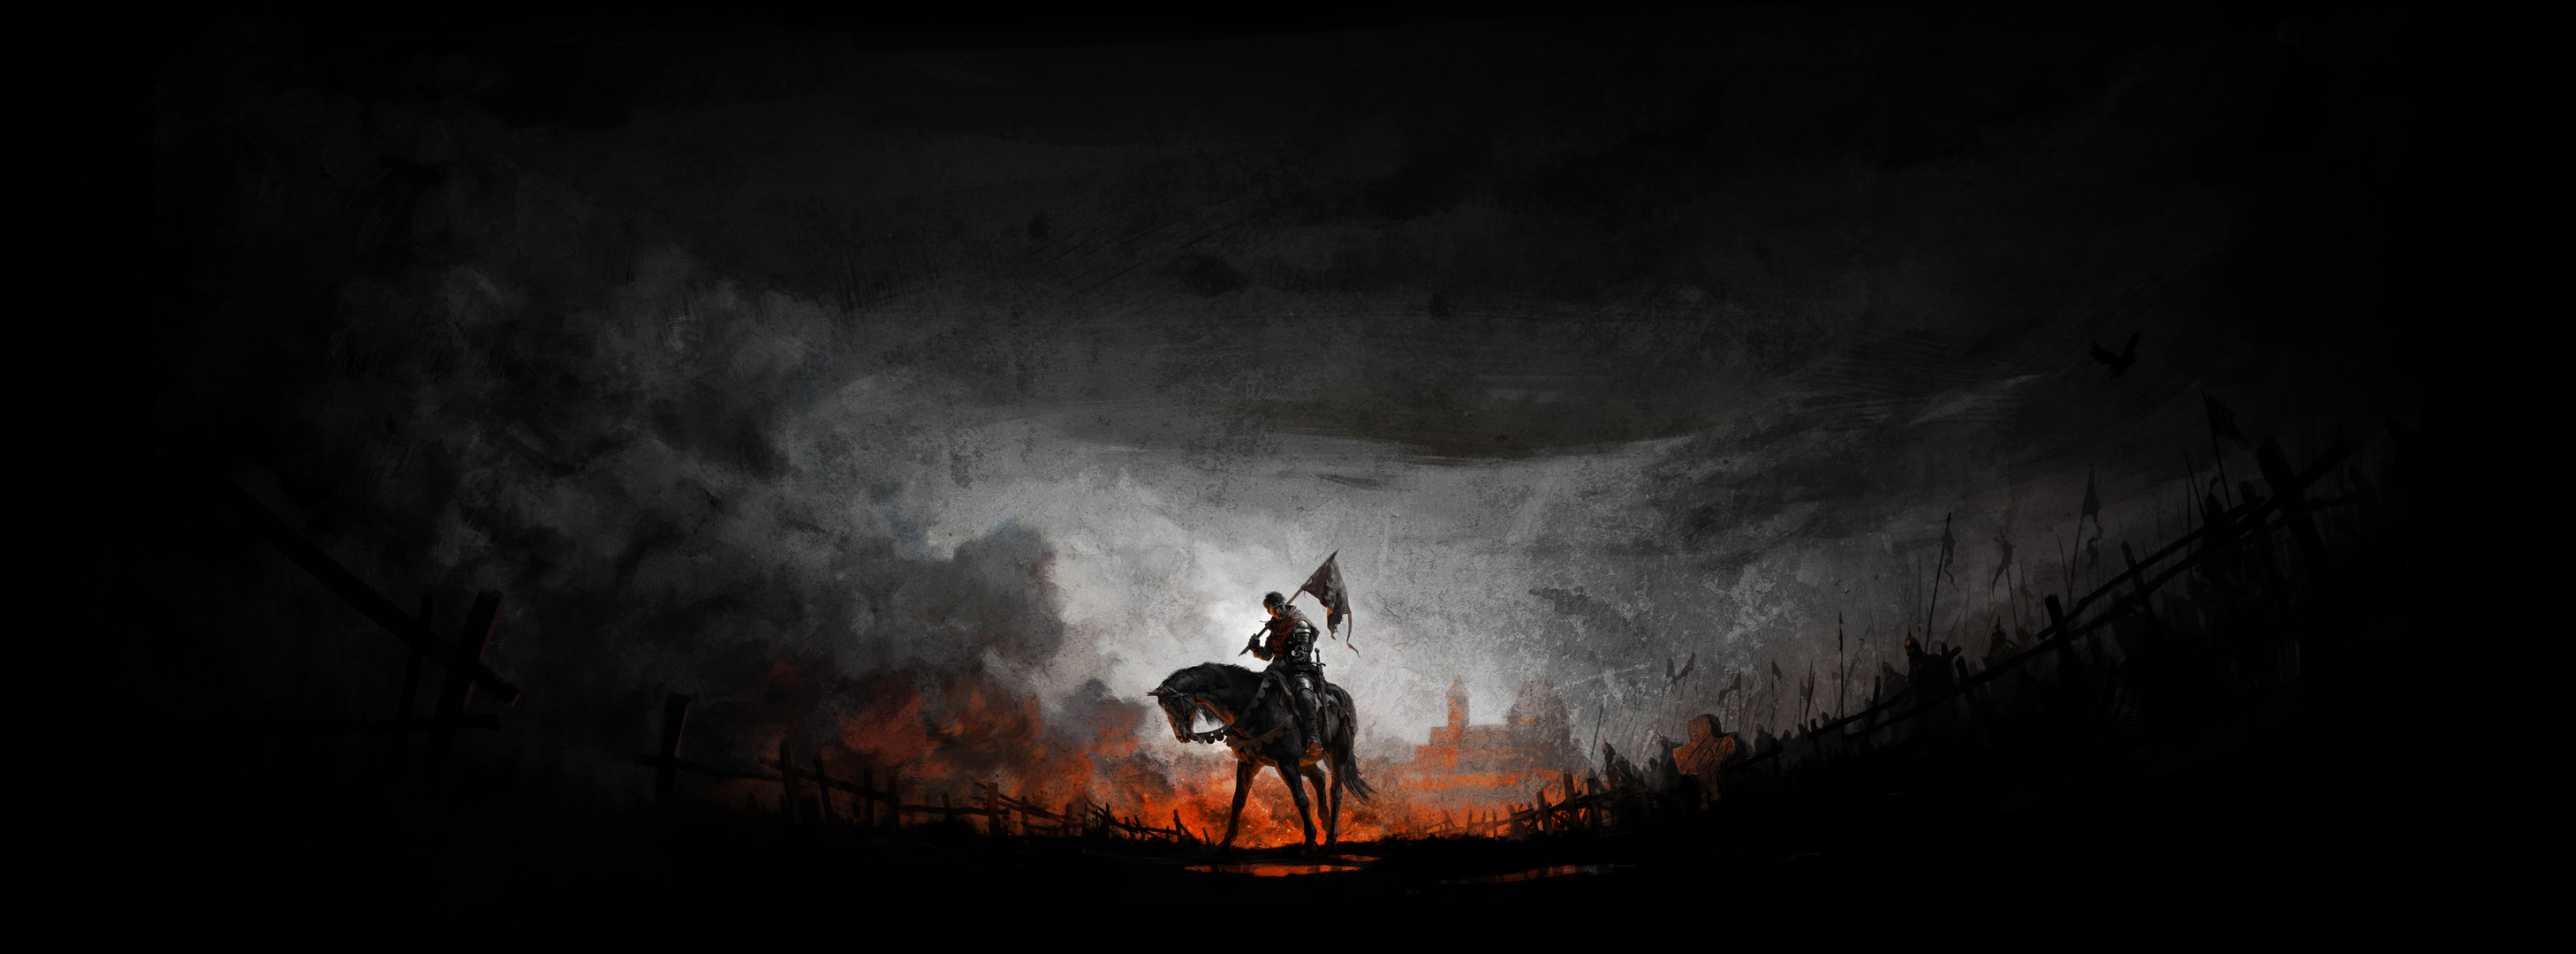 Kingdom Come Deliverance Wallpaper, HD Games 4K Wallpapers ...